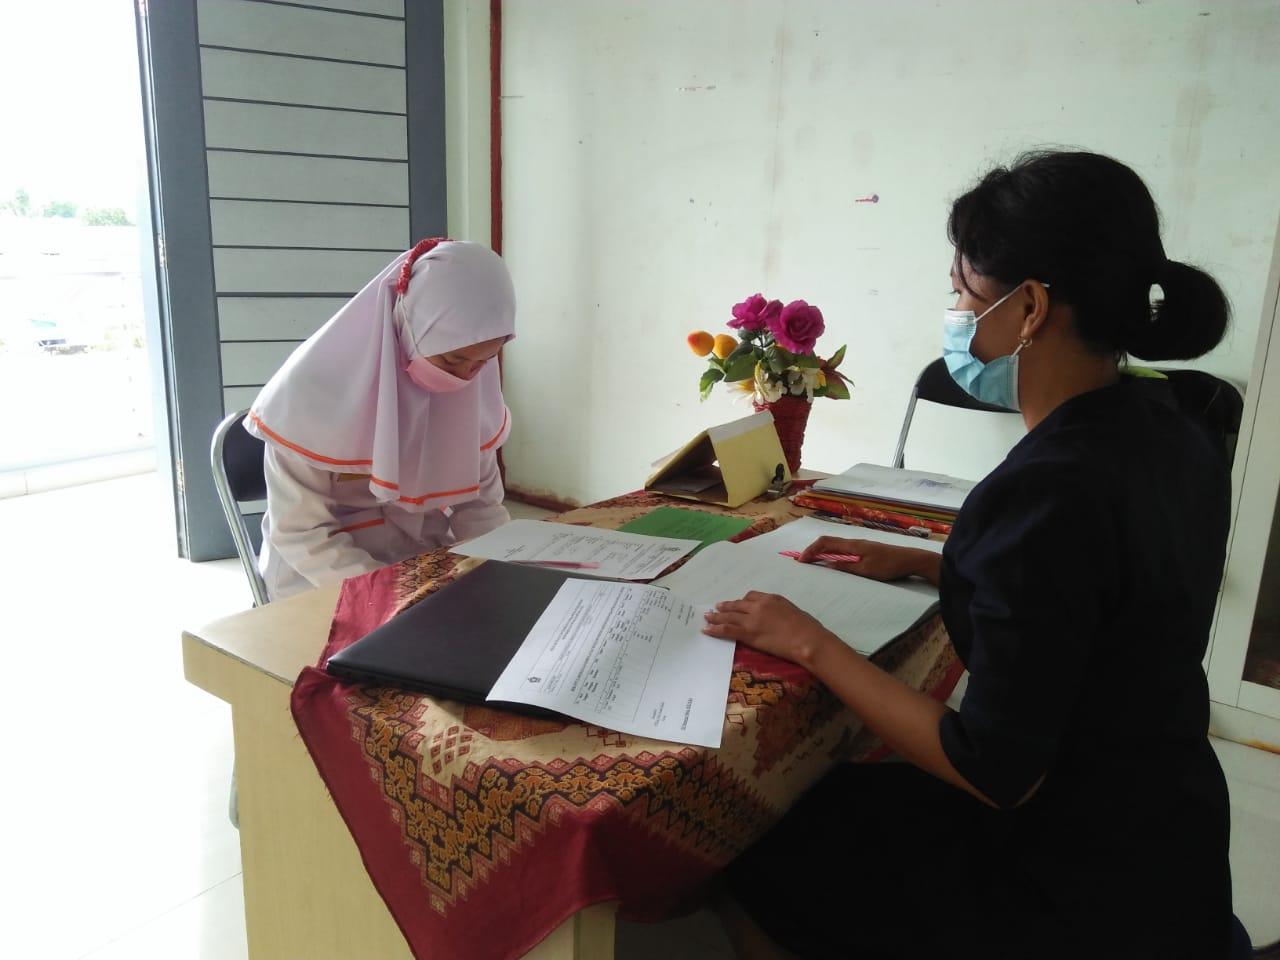 Layanan Bimbingan dan Konseling Kepada Mahasiswa STIKes Mitra Husada Medan